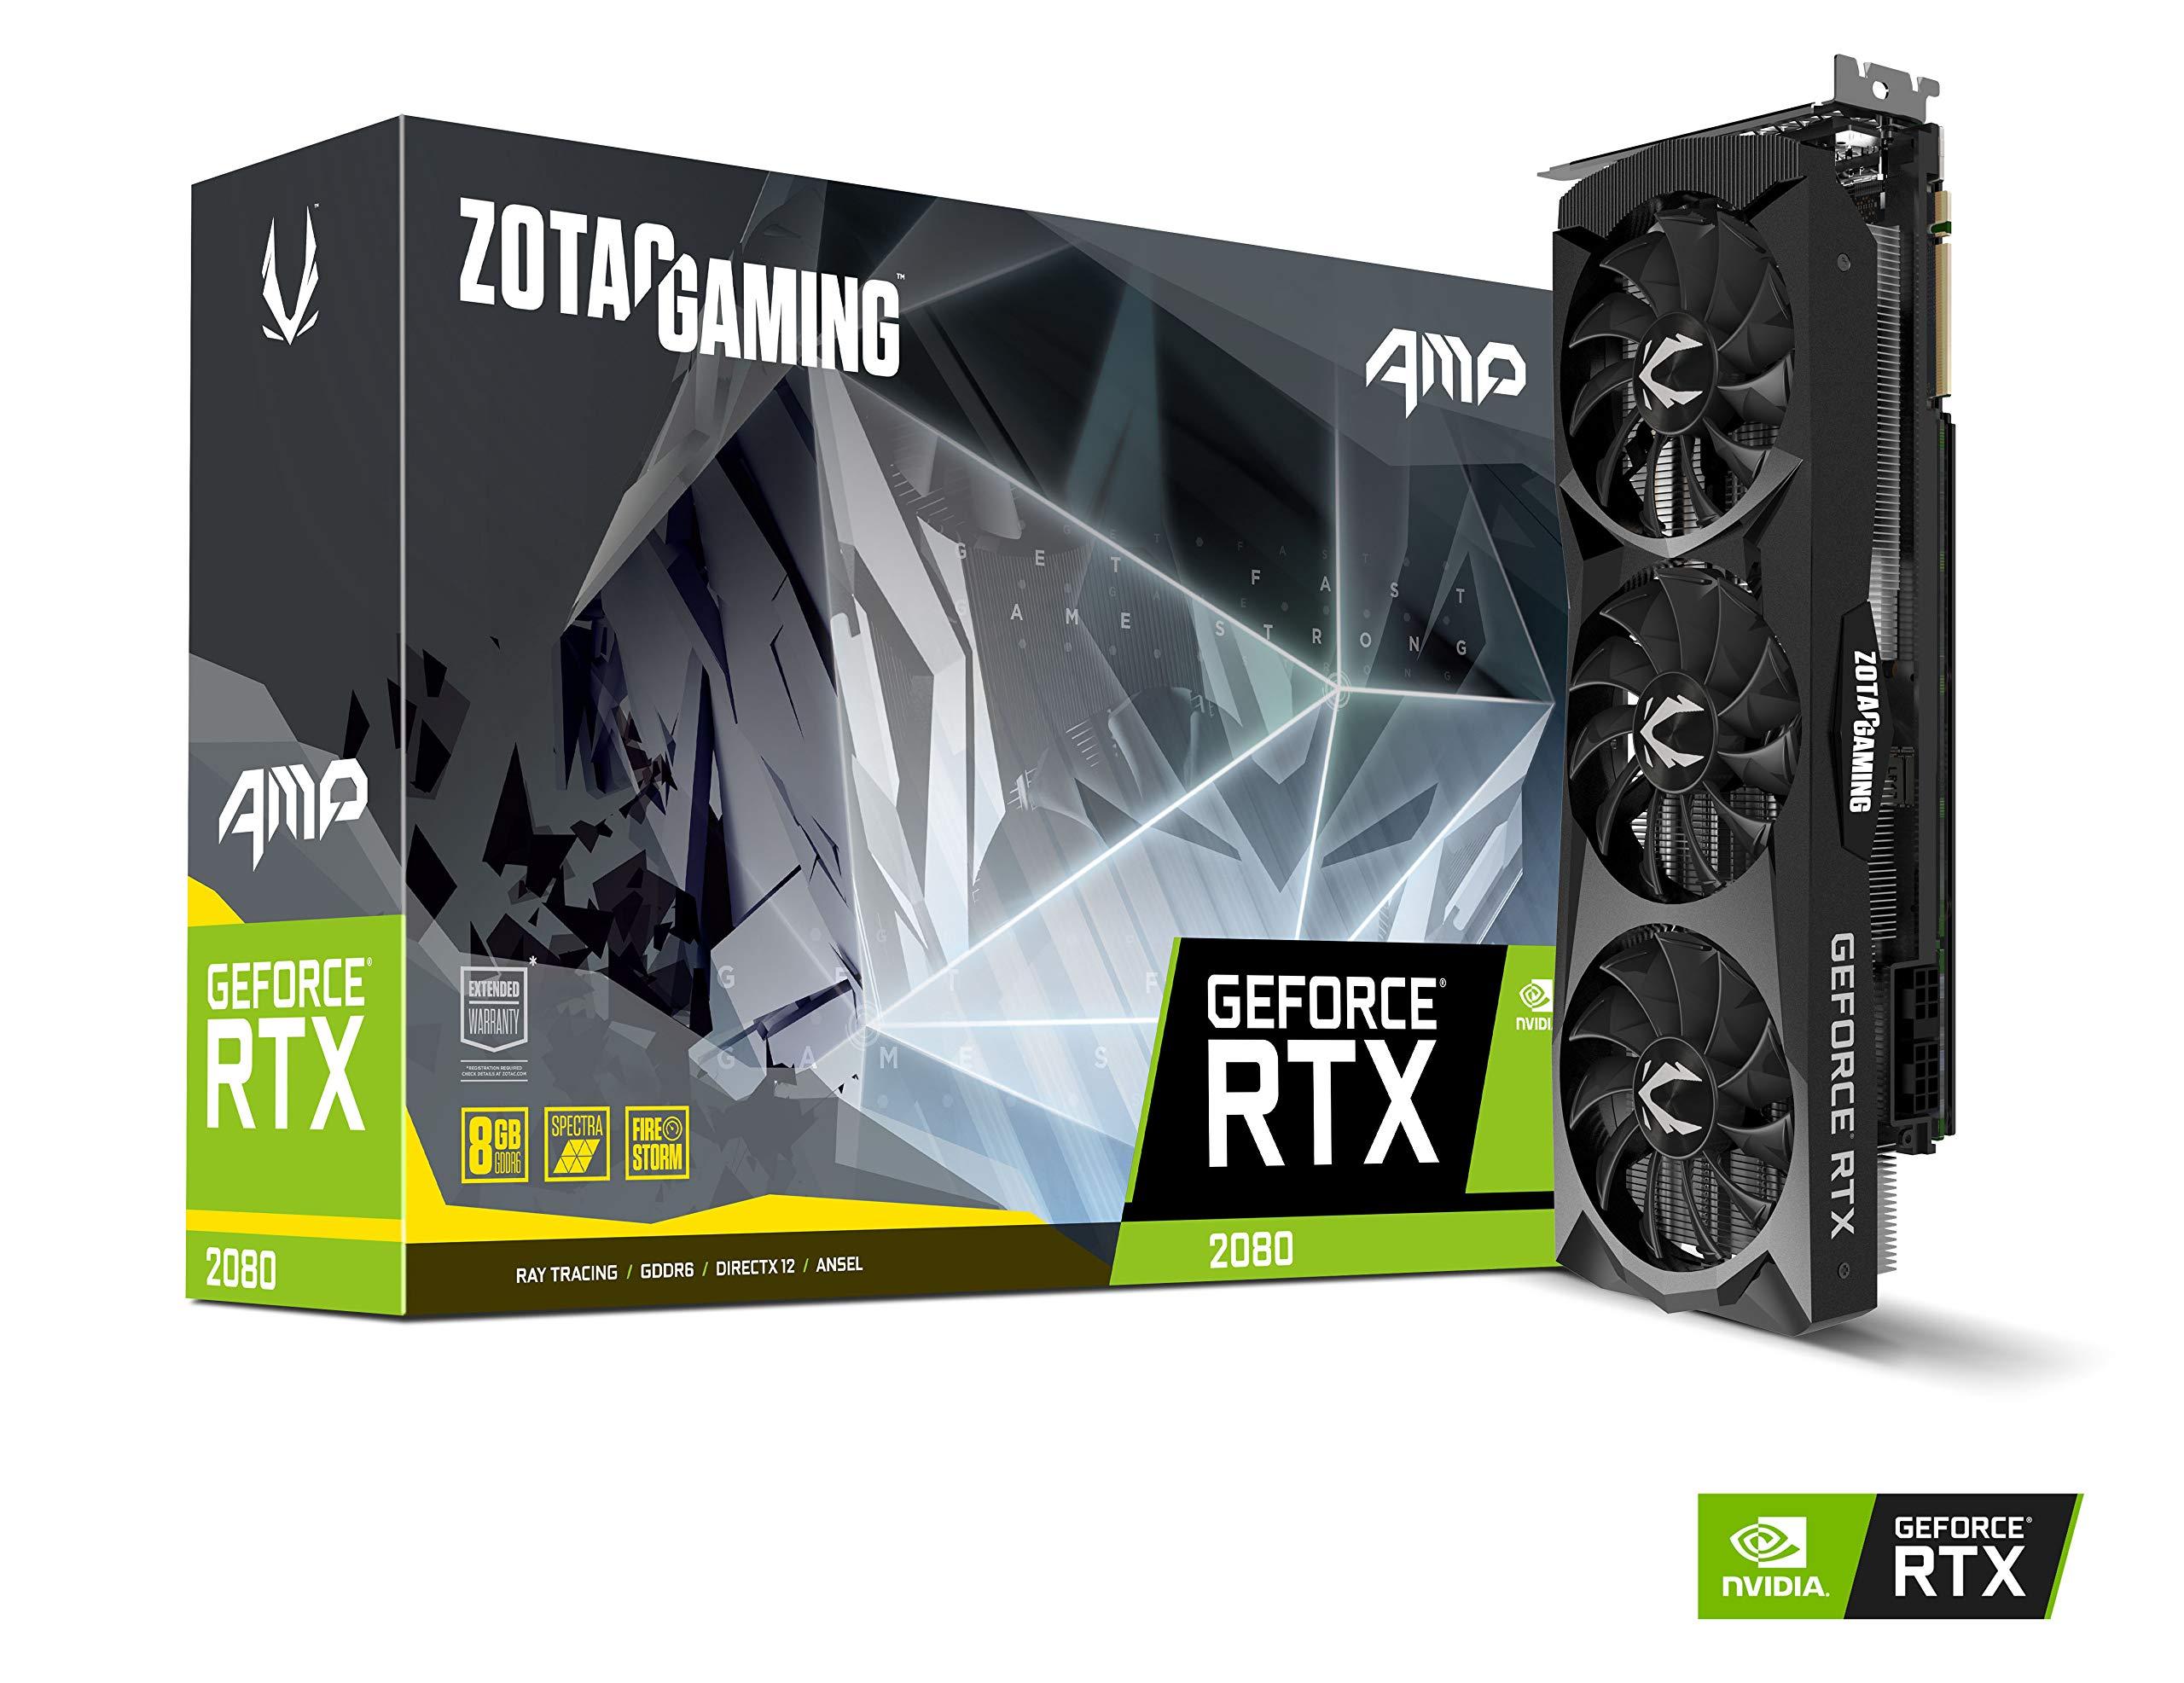 ZOTAC GAMING GeForce RTX 2080 AMP 8GB GDDR6 256-bit Gaming Graphics Card Triple Fan Metal Backplate LED - ZT-T20800D-10P